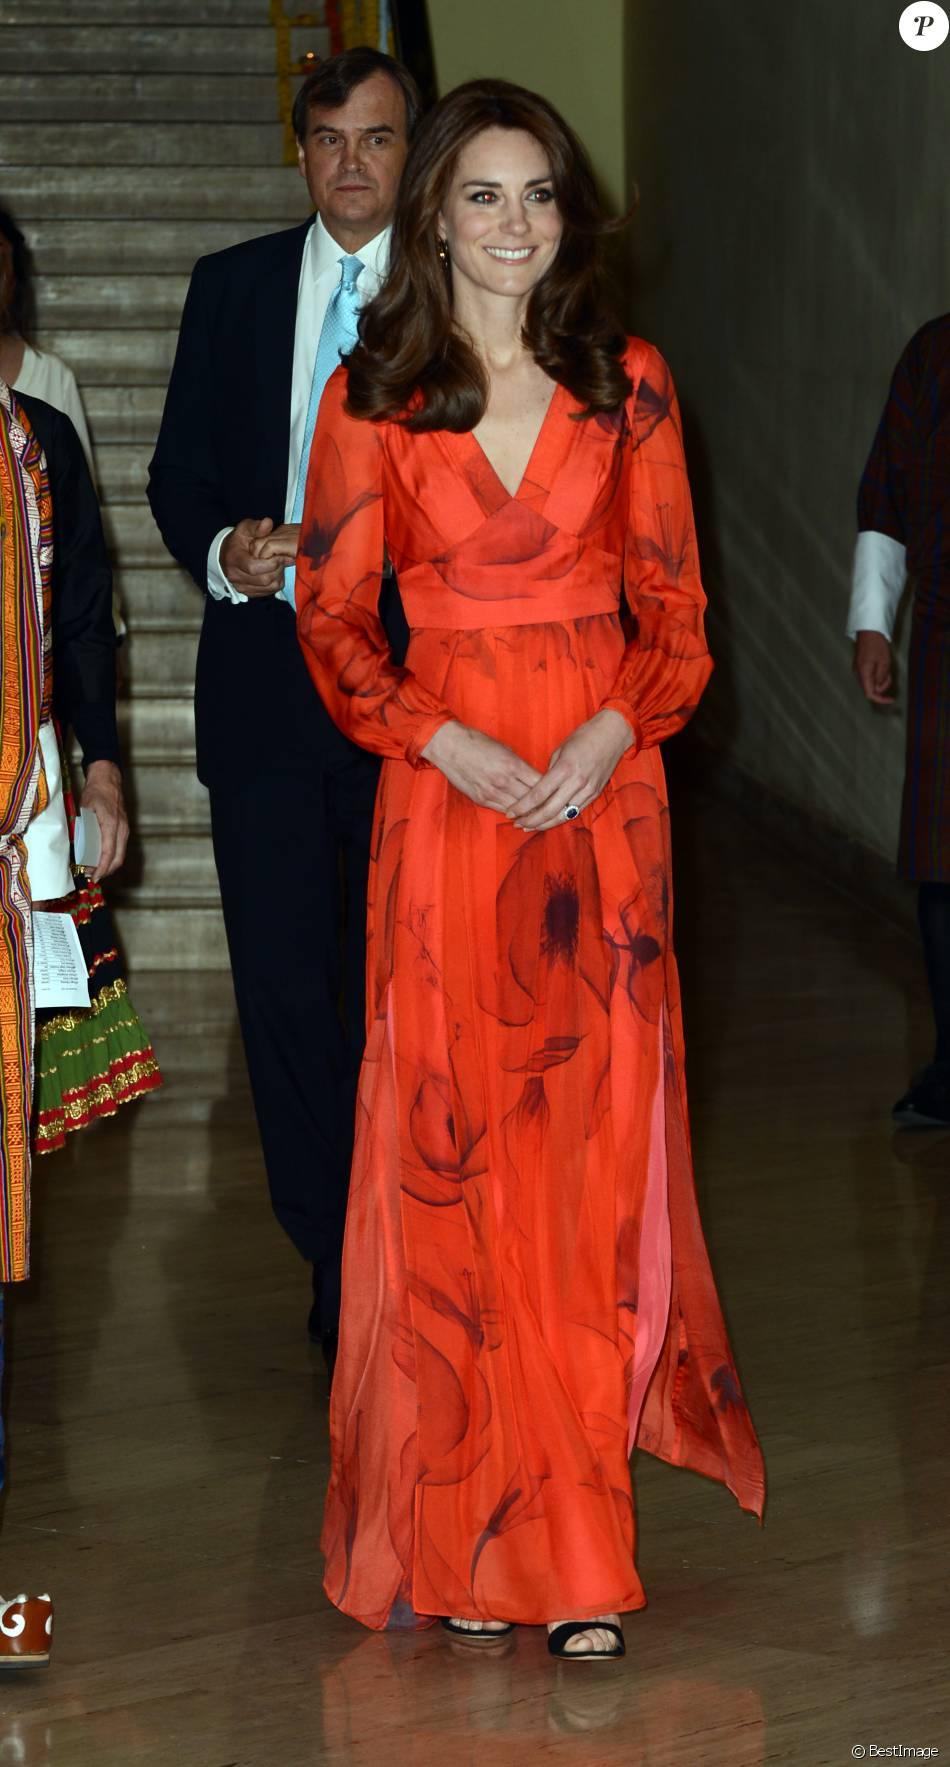 Kate Middleton Eblouissante Apr S La Rando Au Revoir